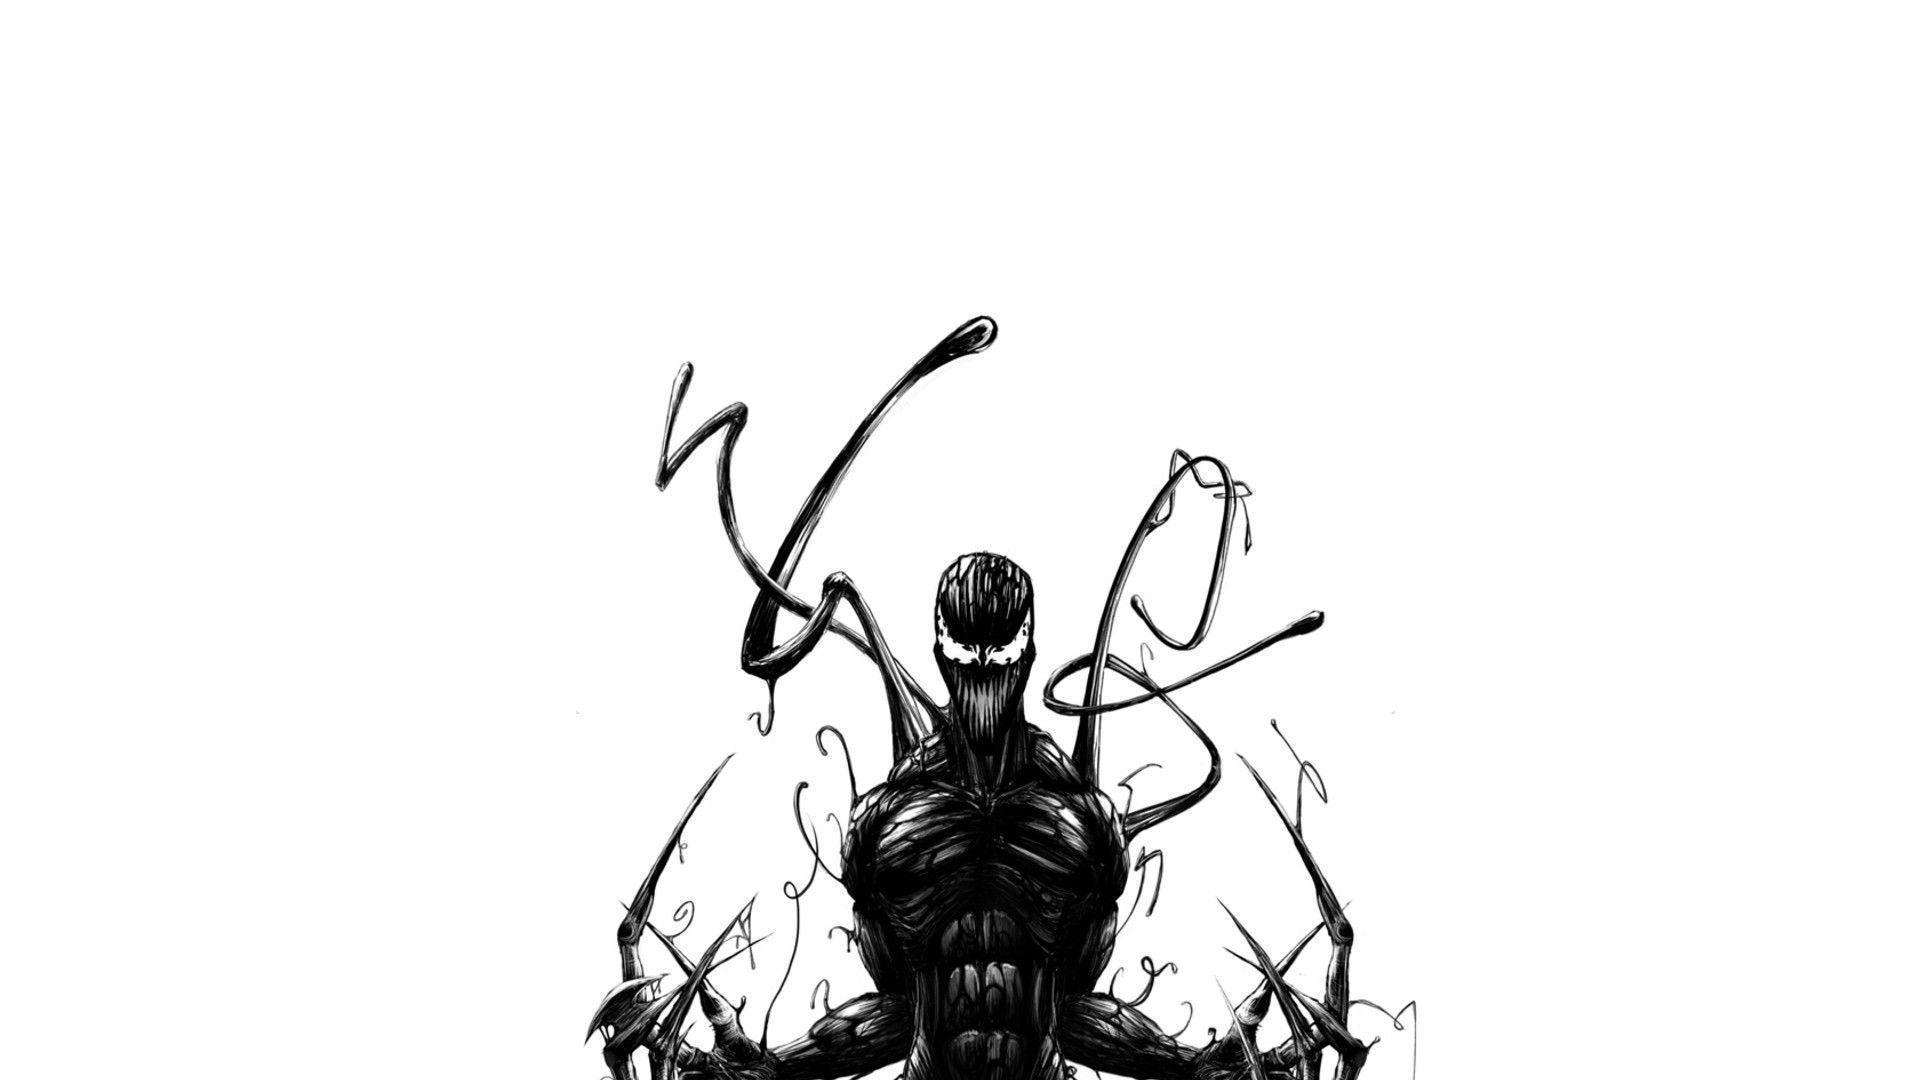 venom wallpaper hd 1920x1080 - photo #28